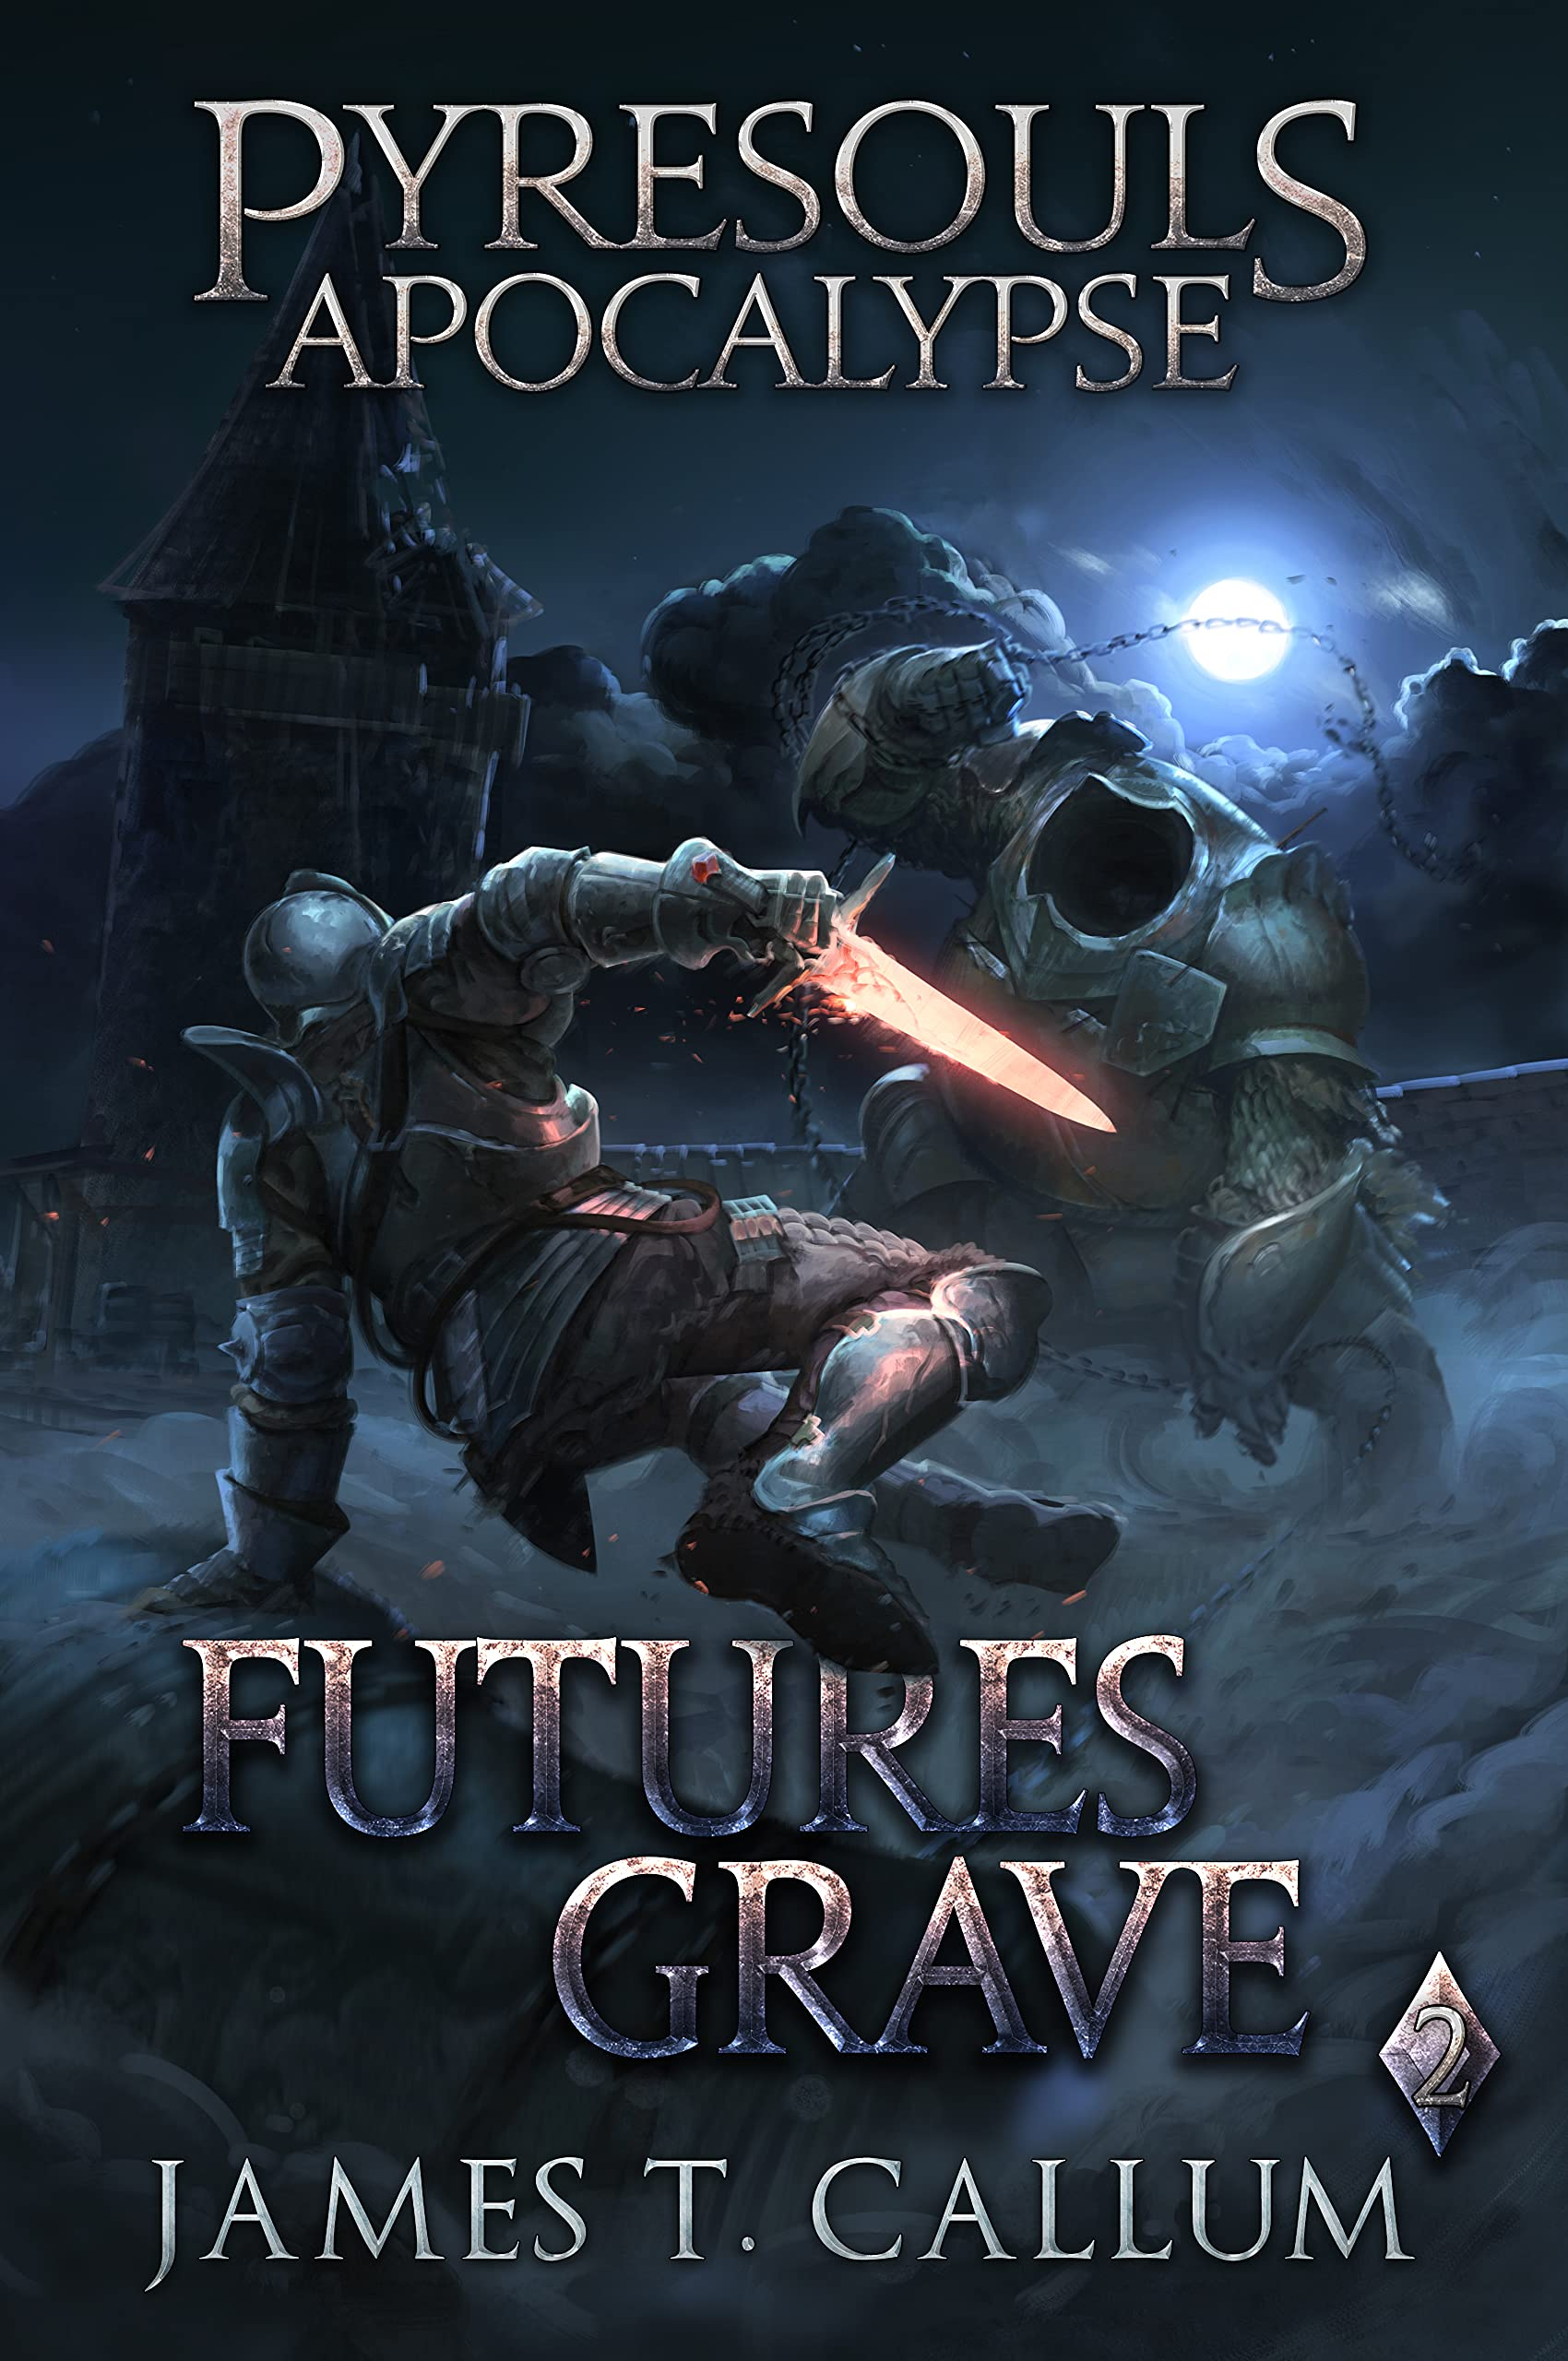 Pyresouls Apocalypse: Futures Grave: A Dark Fantasy LitRPG/Gamelit Story (Pyresouls Apocalypse, Book 2)